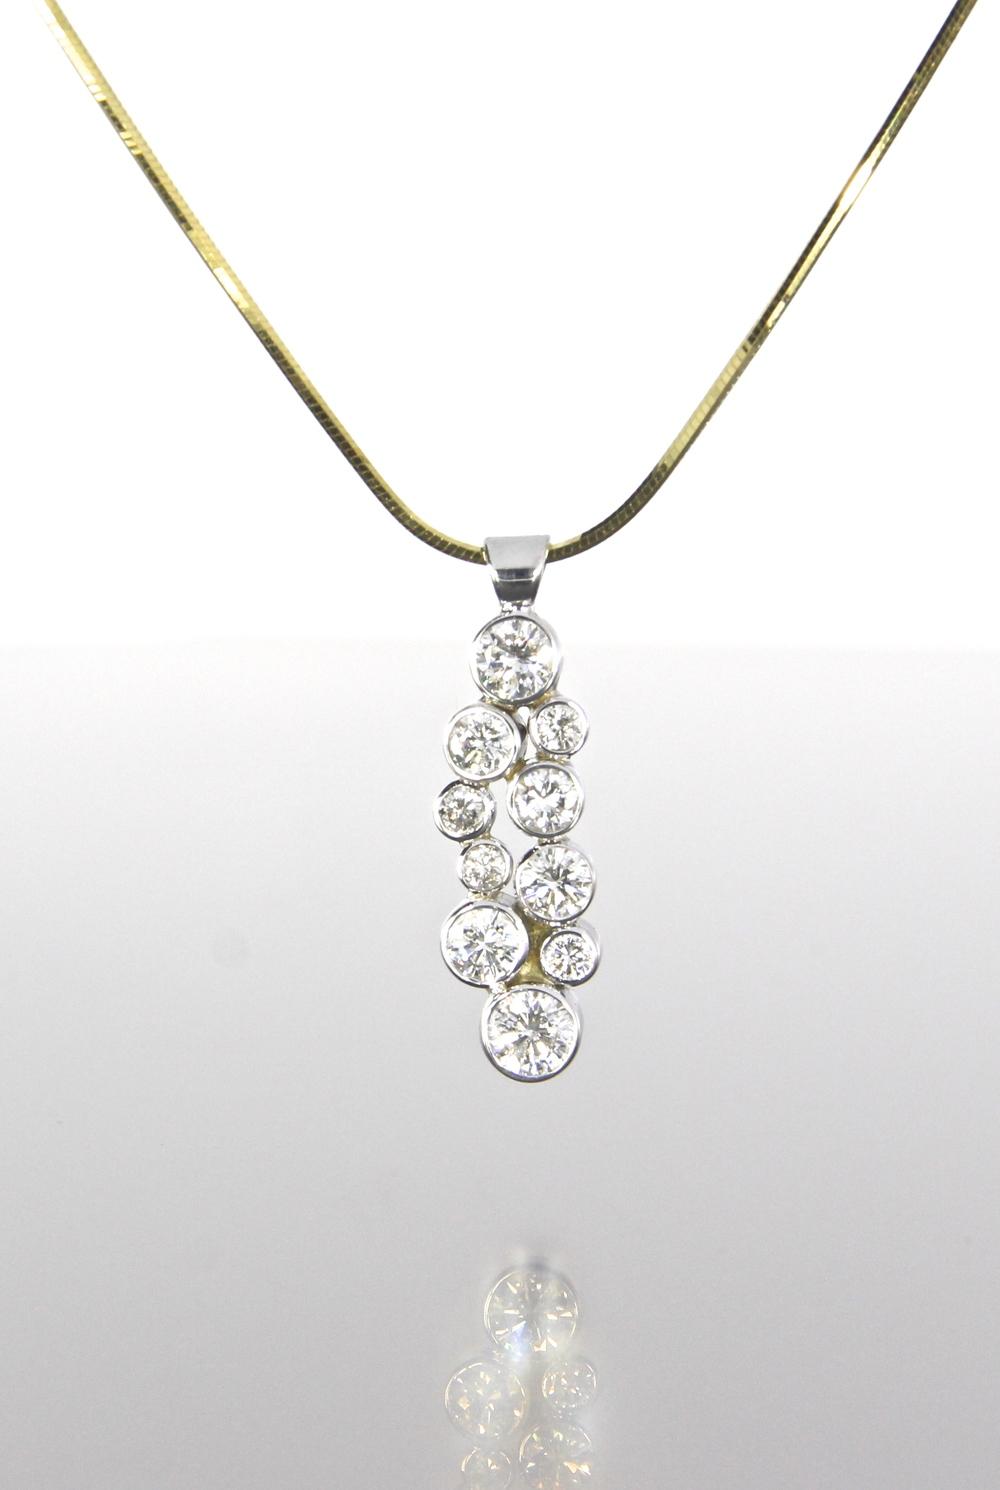 unique-morganite-diamond-halo-rose-gold-pendant-craft-revival-jewelry-store-craft-revival-jewelry-store-grand-rapids